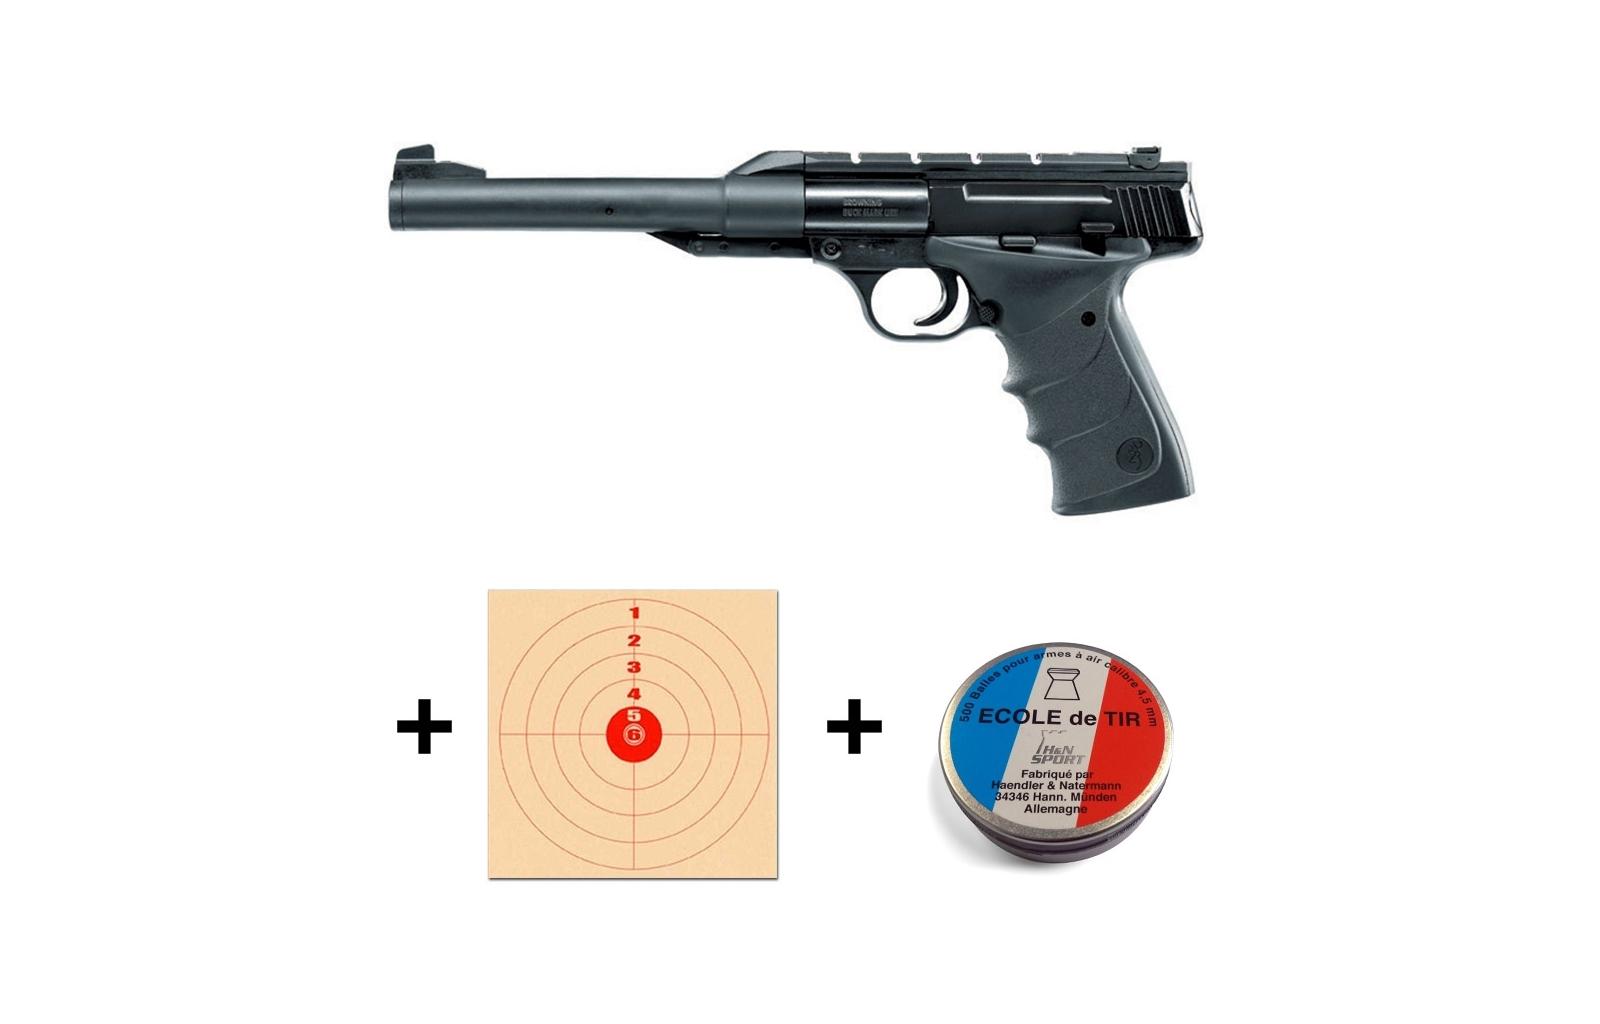 Kit Pistolet Browning Buck Mark 500 Plombs 100 Cibles